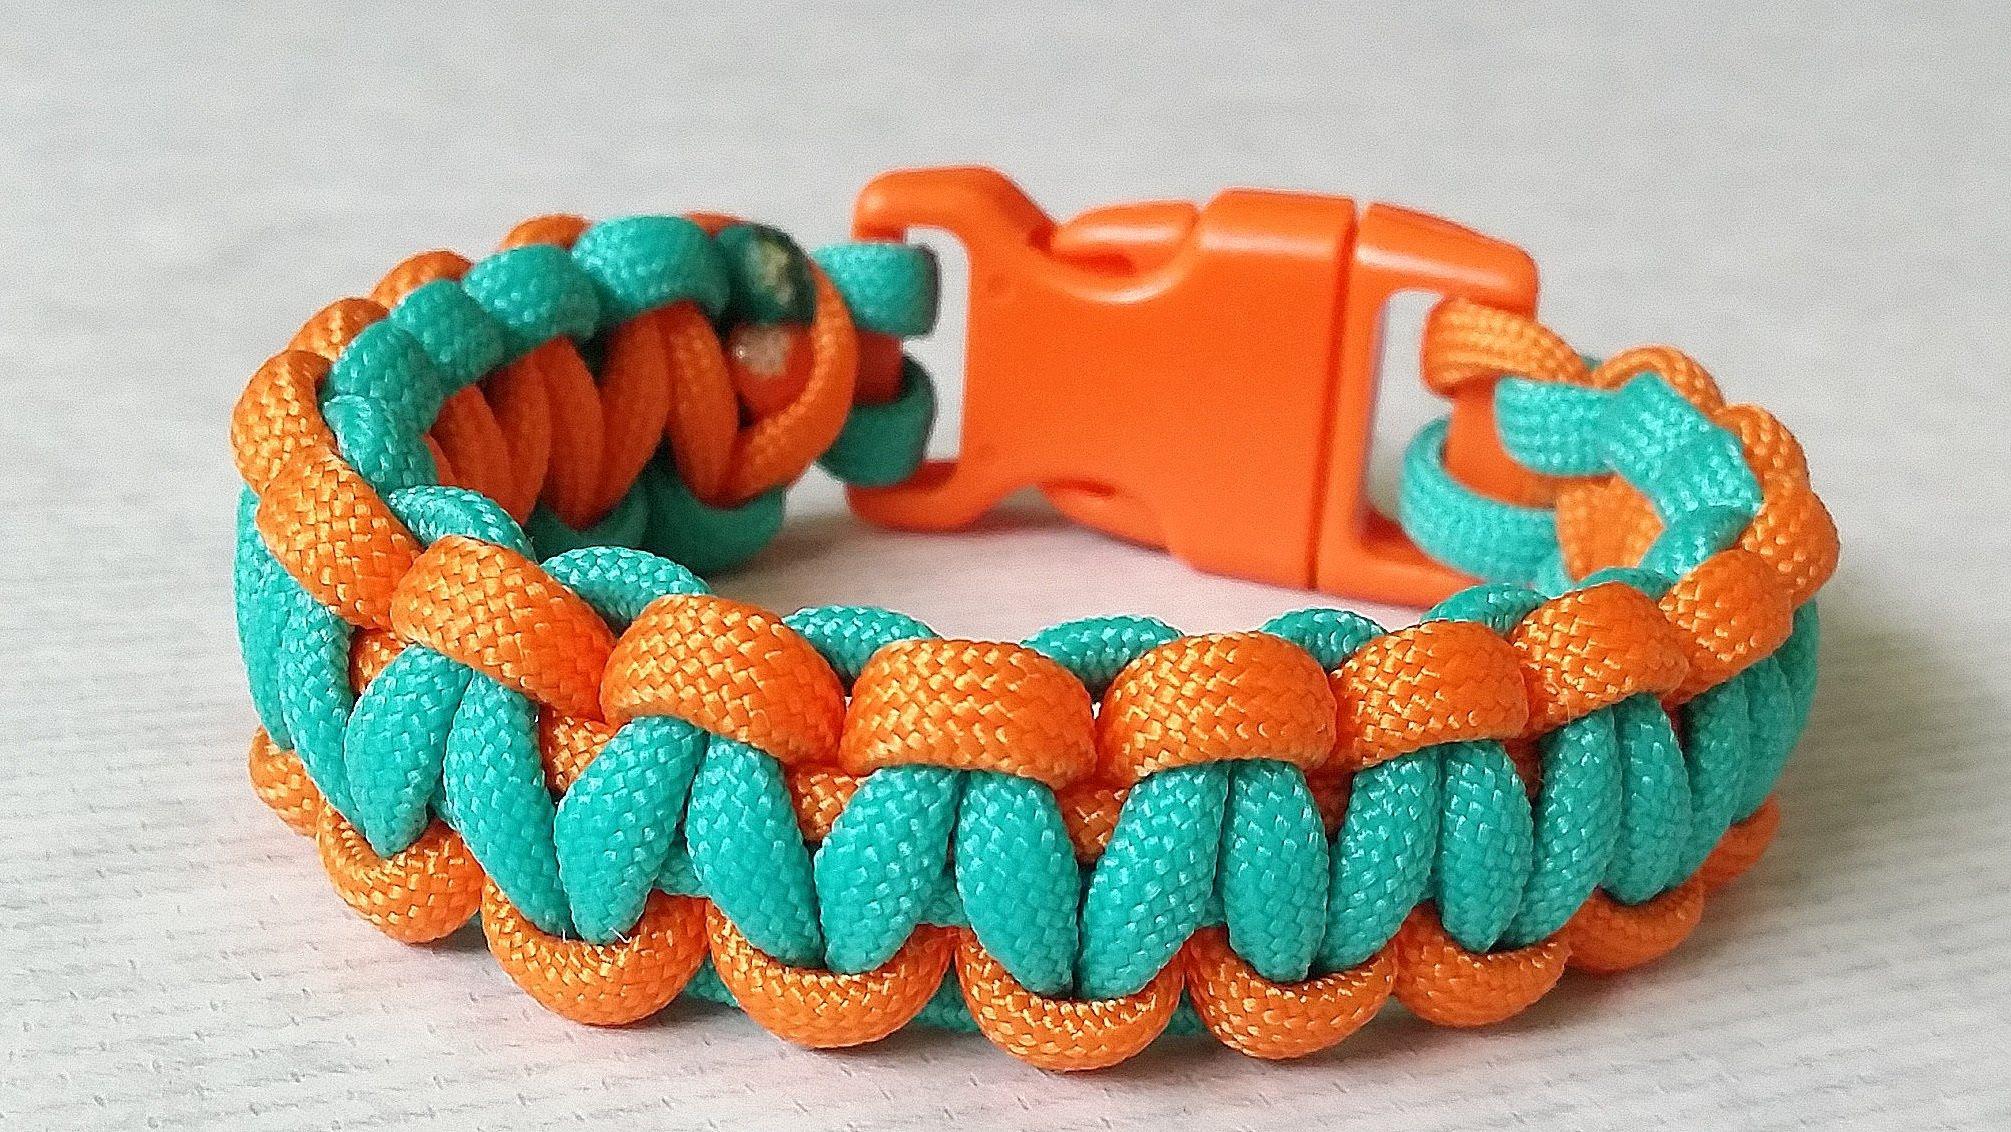 Two Color Trilobite Bracelet With Images Paracord Projects